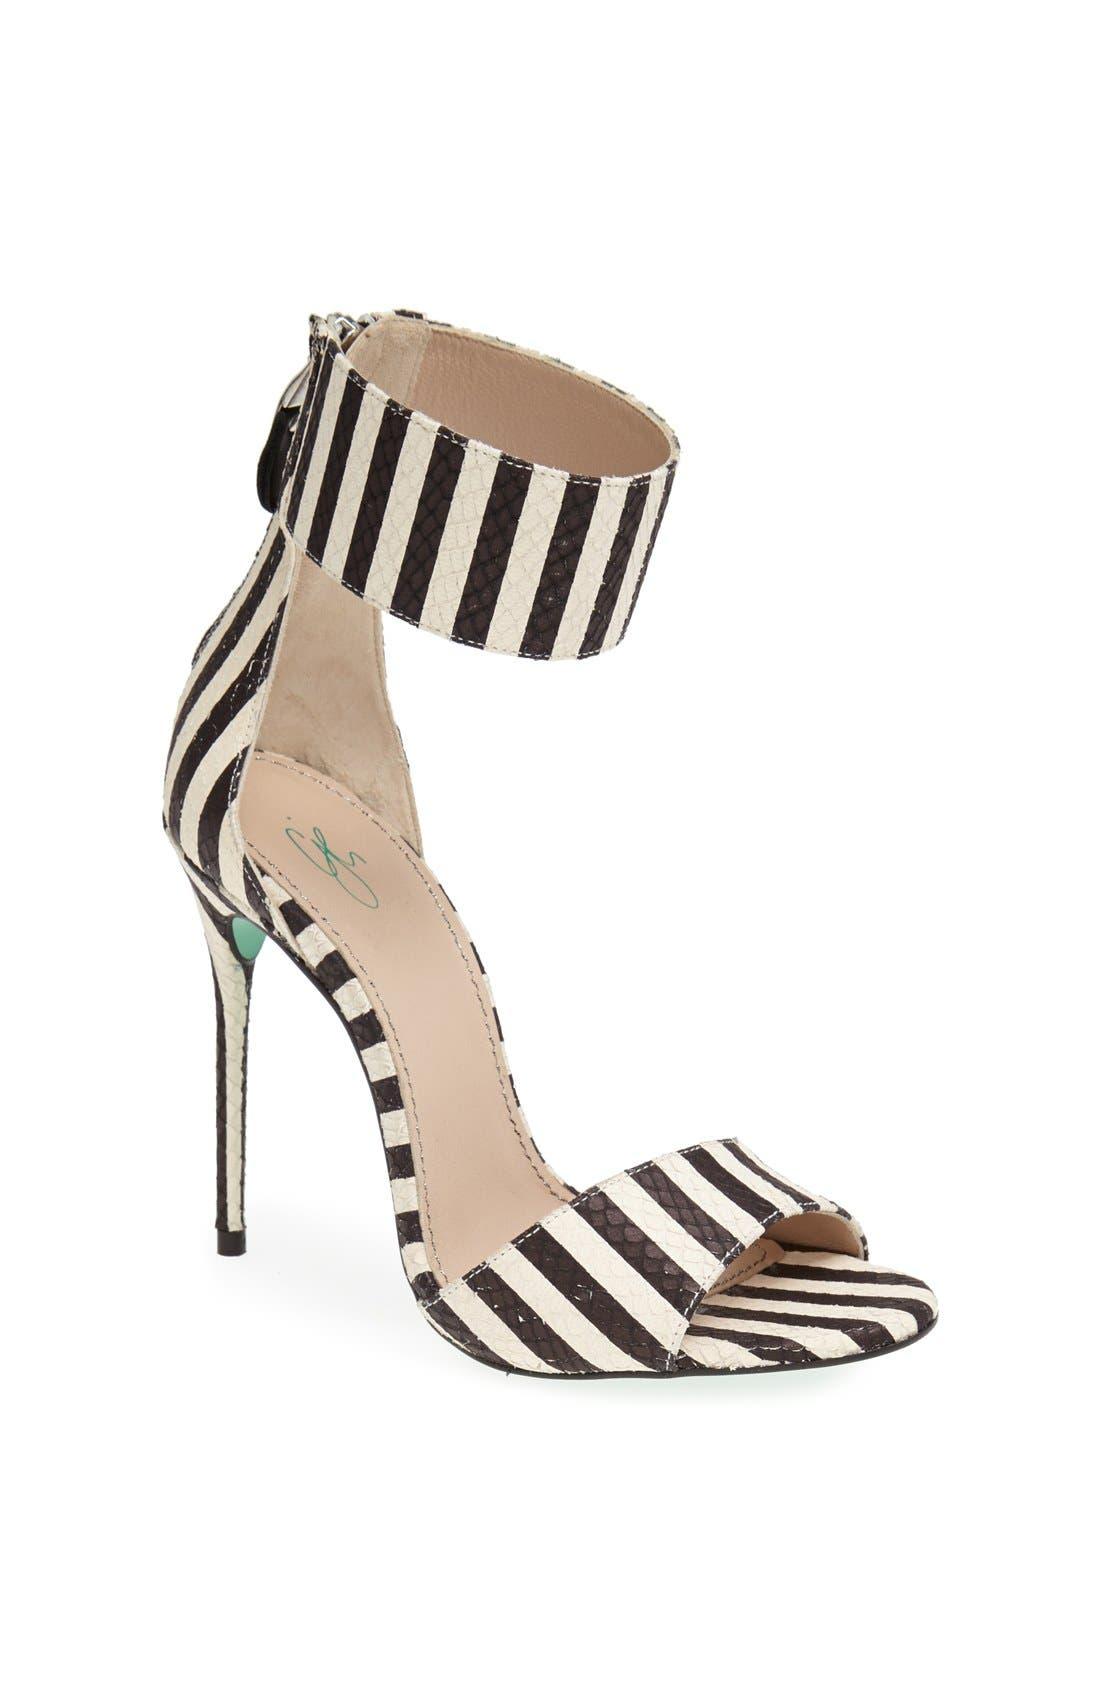 Alternate Image 1 Selected - CJG 'Malibu' Sandal